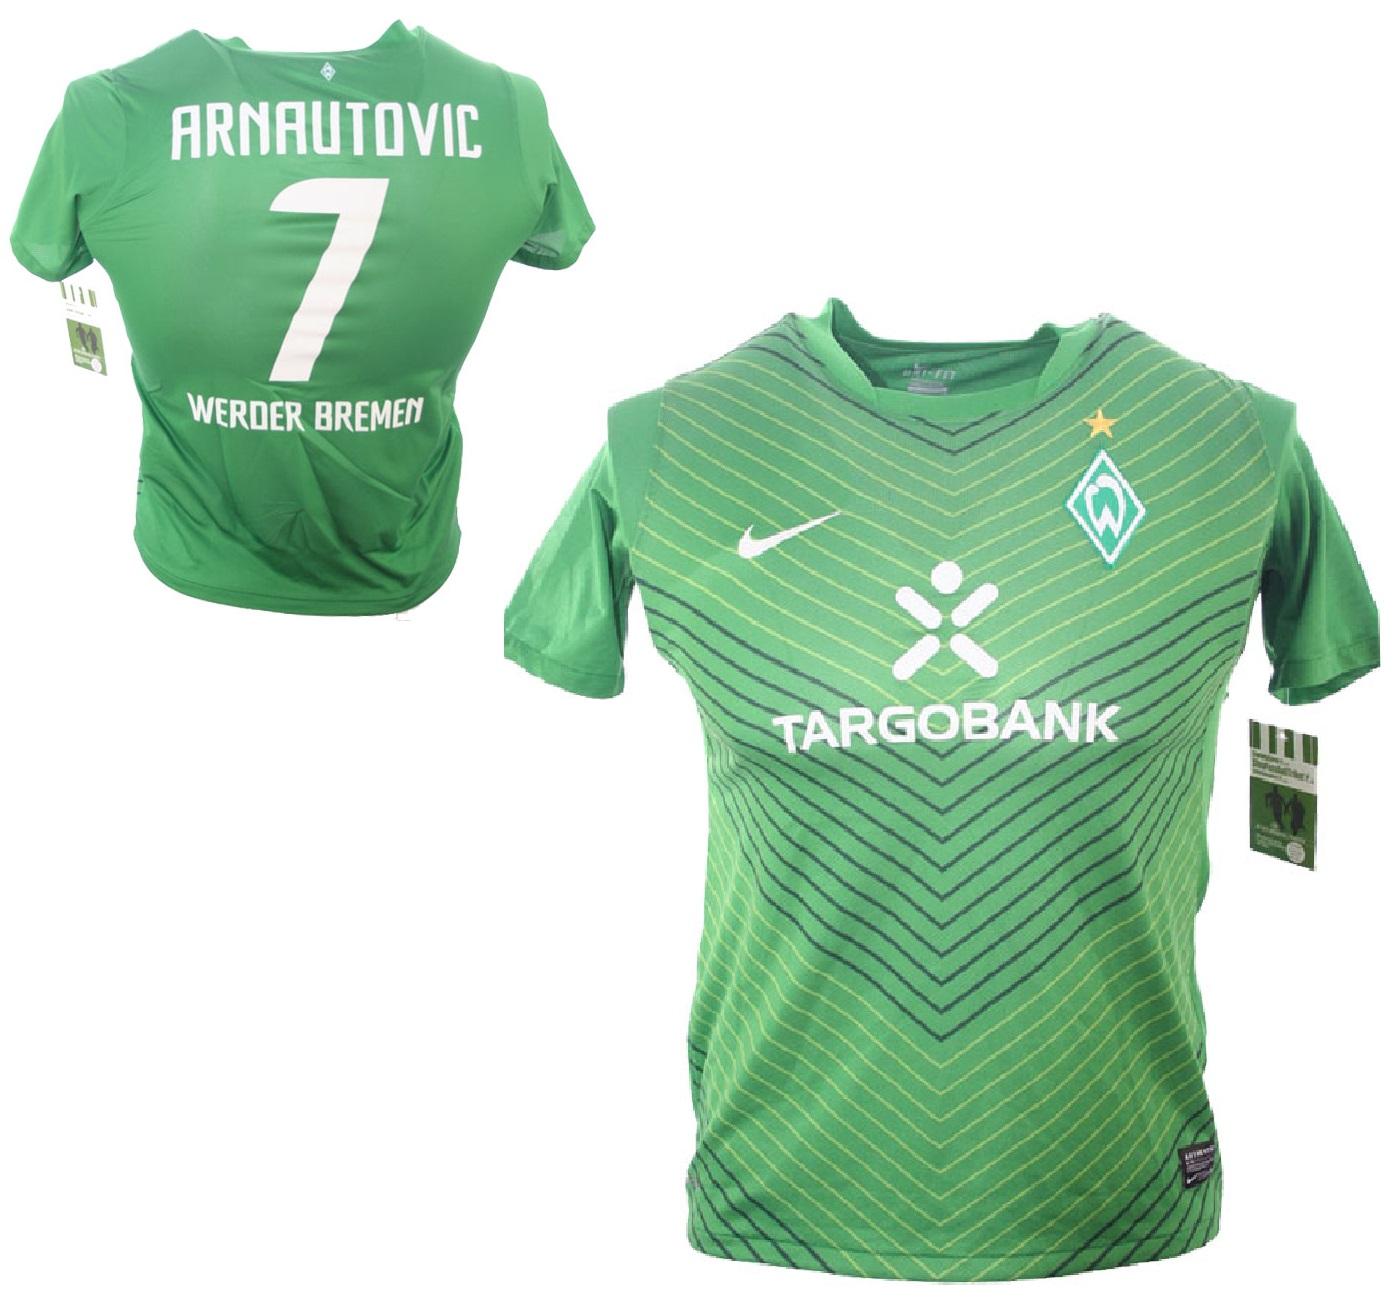 a2203f221a783 Nike SV Werder Bremen jersey 7 Marko Arnautovic 2011/12 green home men's  S-M 164cm